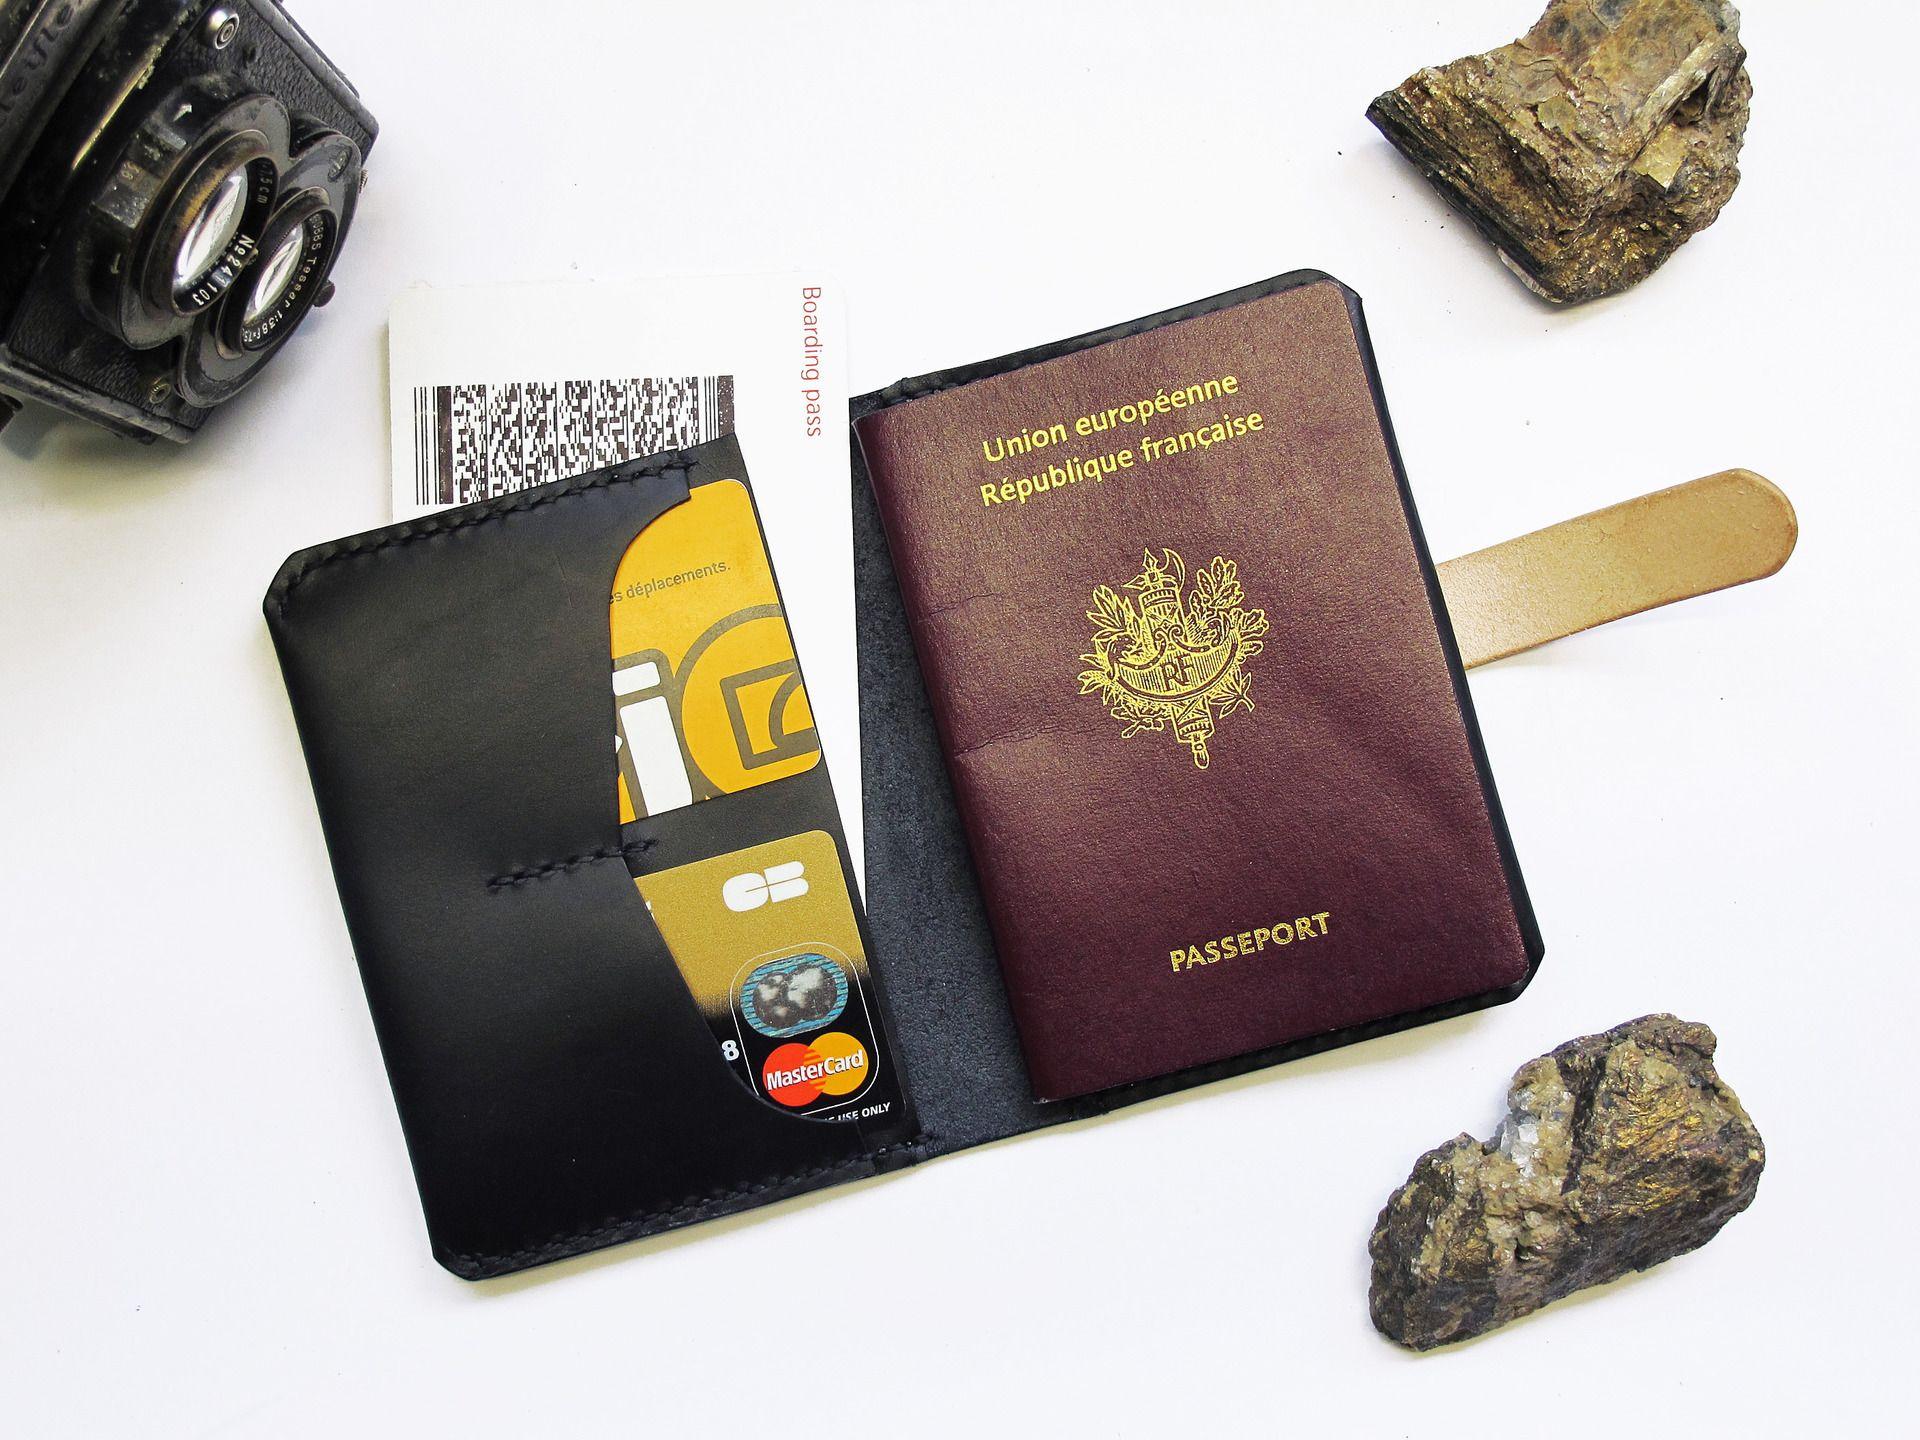 etuis passeport en cuir noir portefeuille voyage homme femme porte monnaie portefeuilles. Black Bedroom Furniture Sets. Home Design Ideas